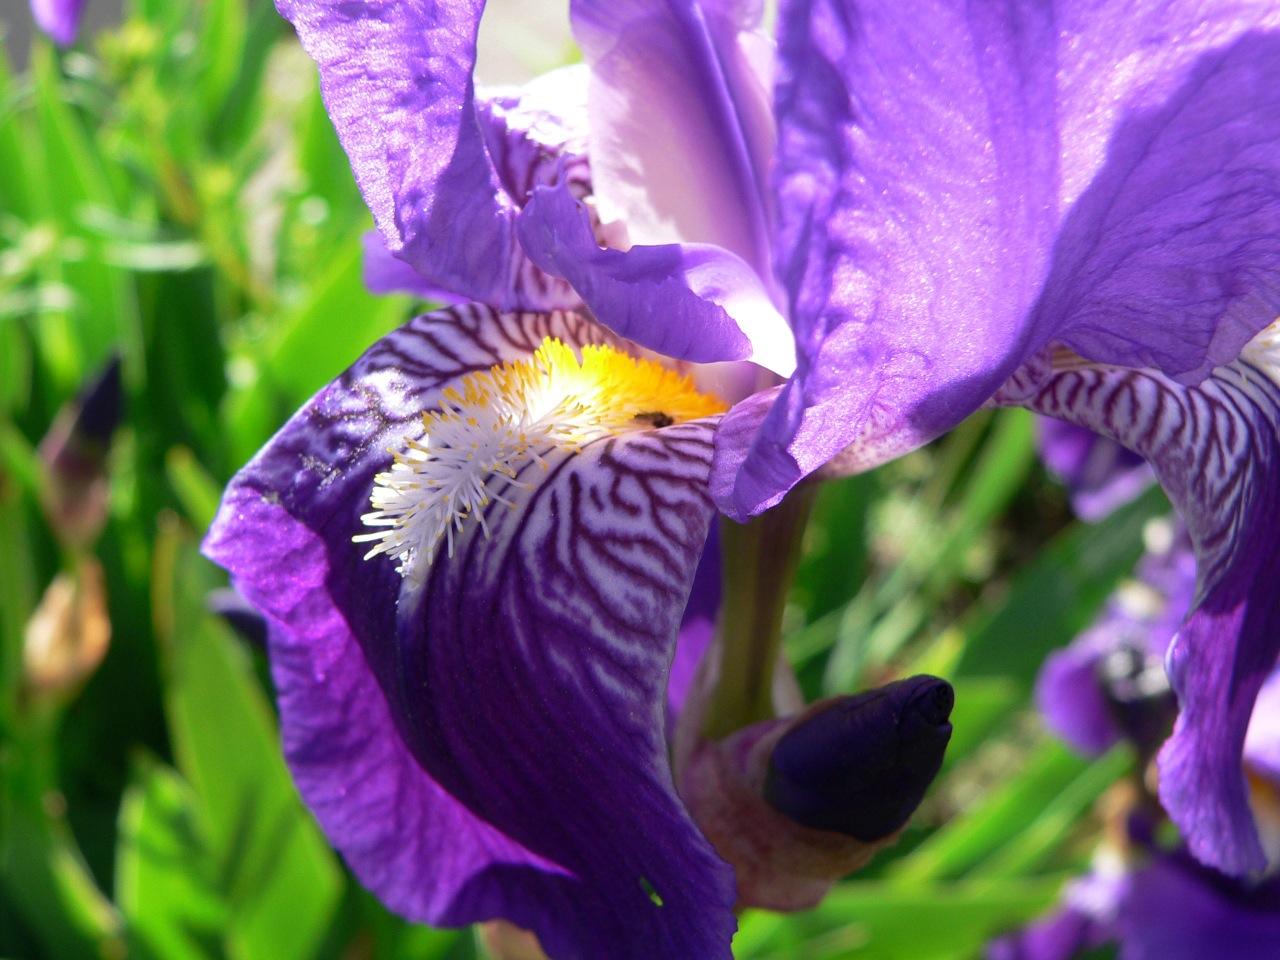 l'iris tire la langue